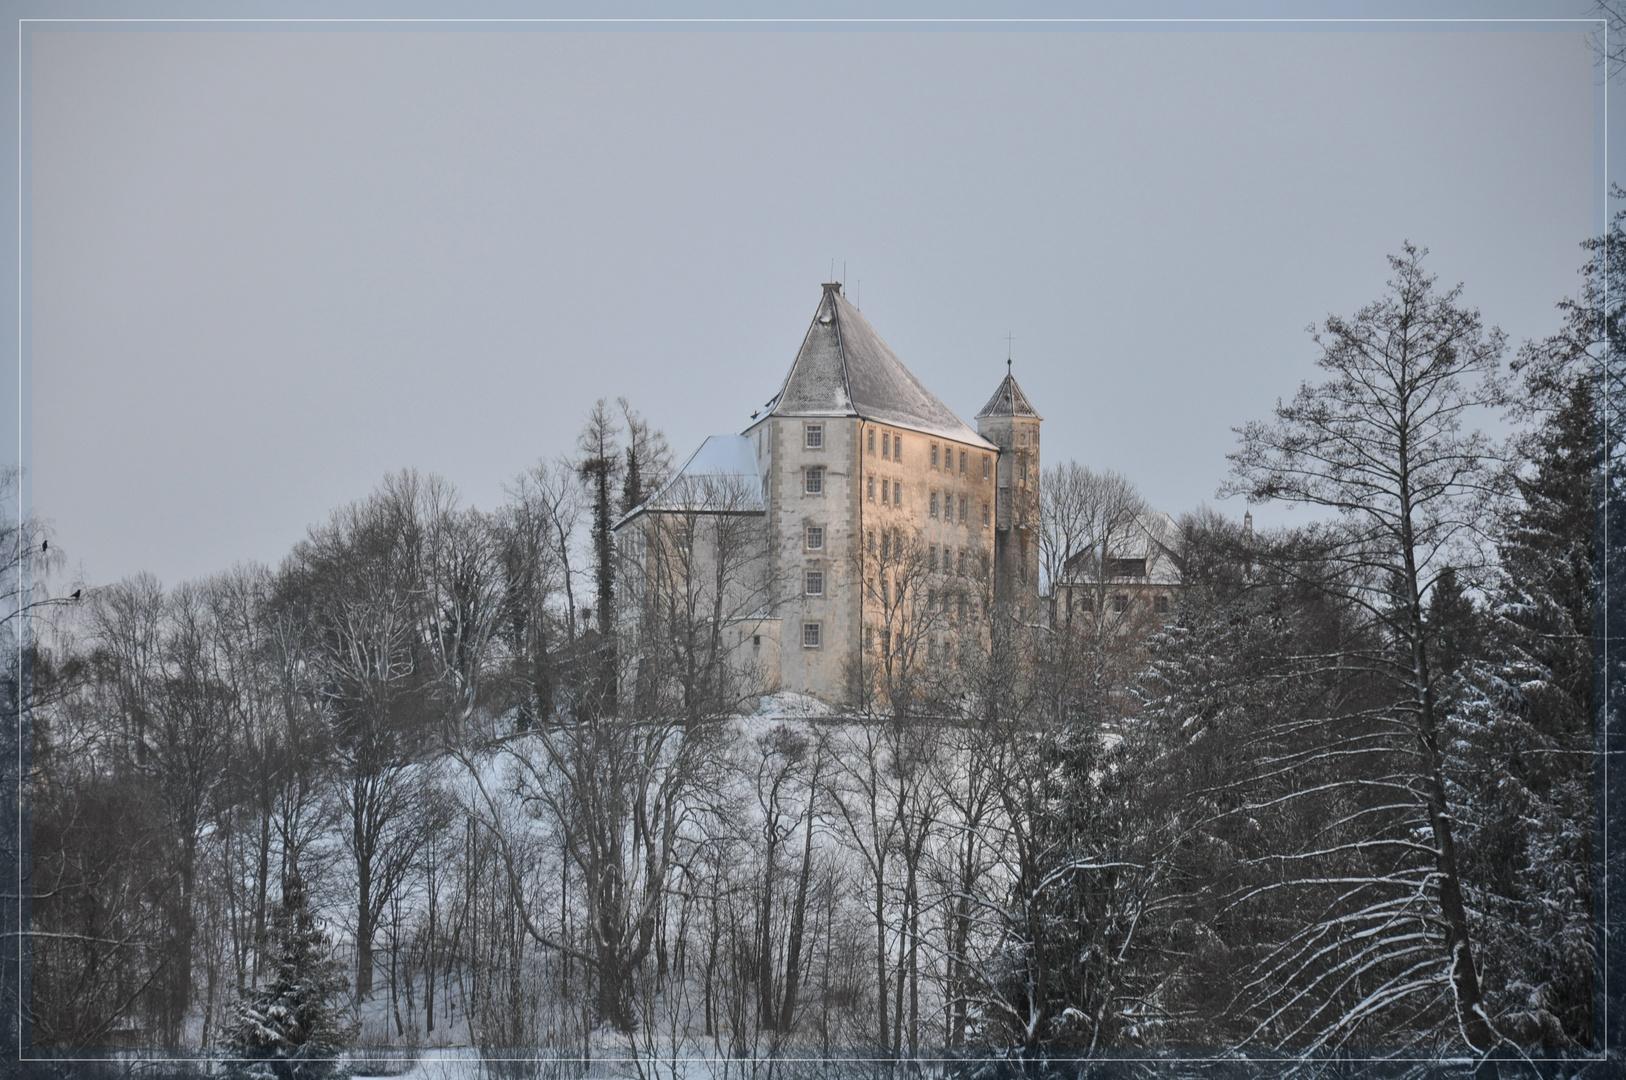 Schloß Bad Grönenbach